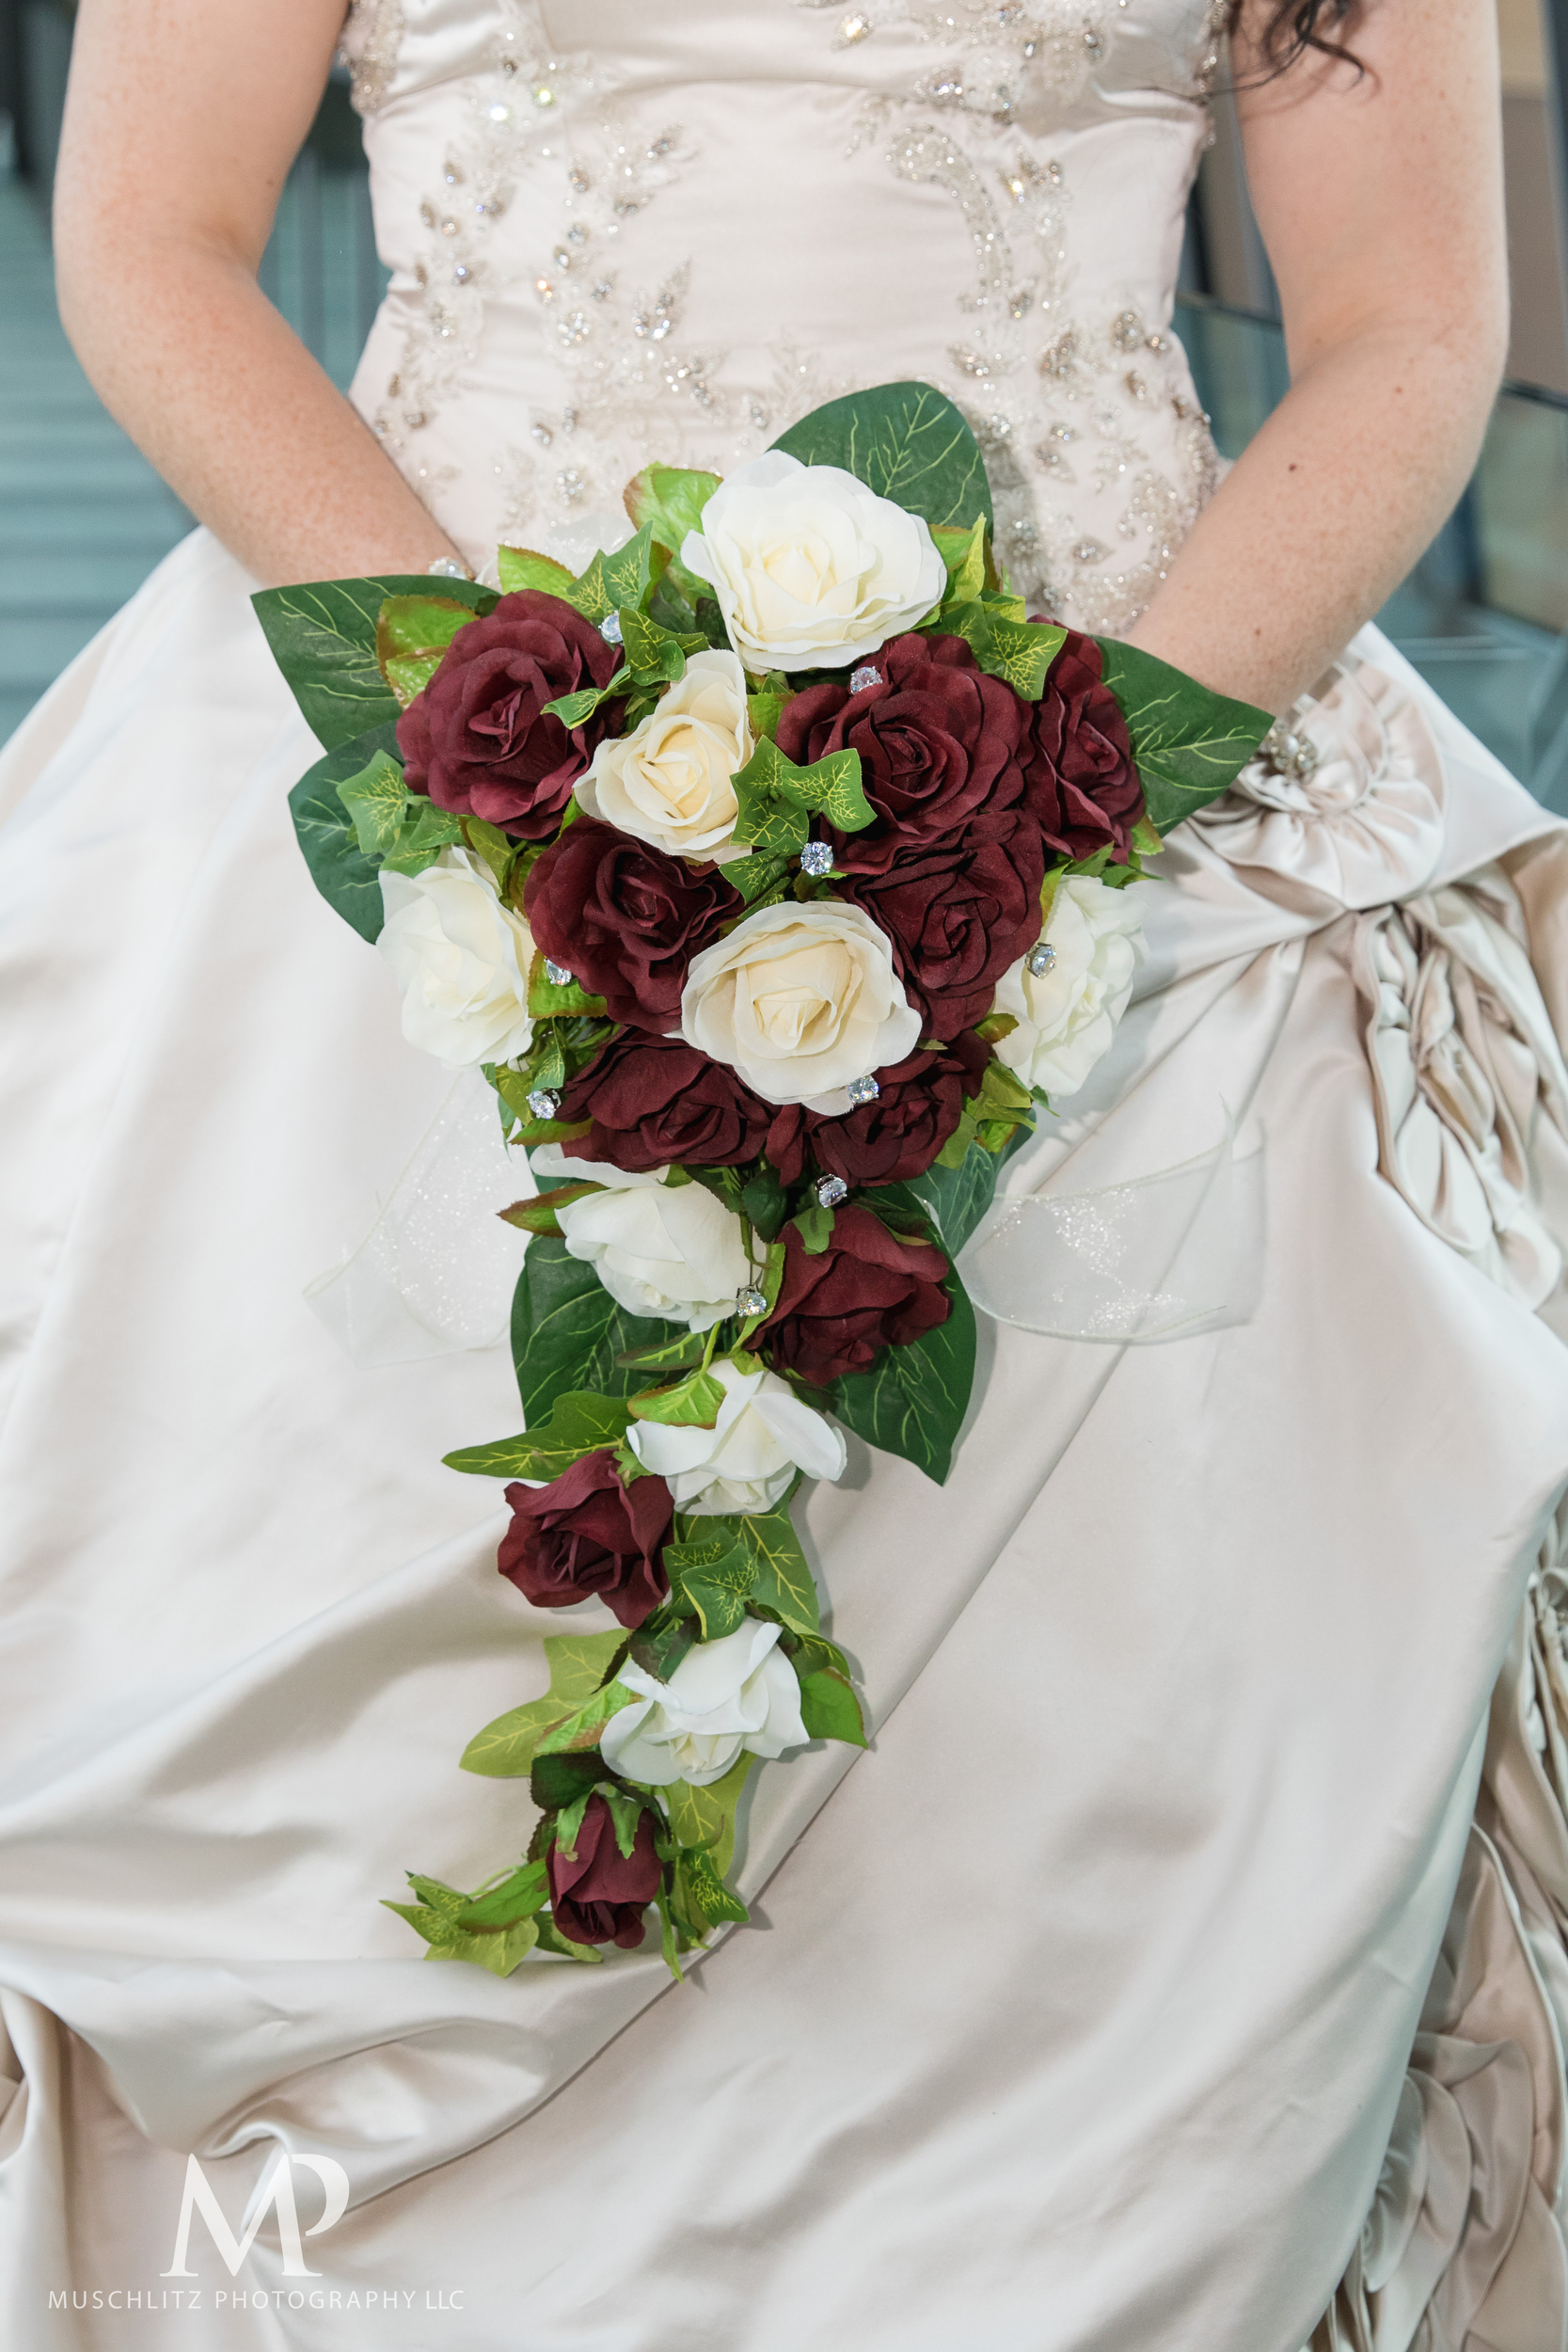 greater-columbus-convention-center-winter-wedding-ceremony-reception-portraits-columbus-ohio-muschlitz-photography-042.JPG